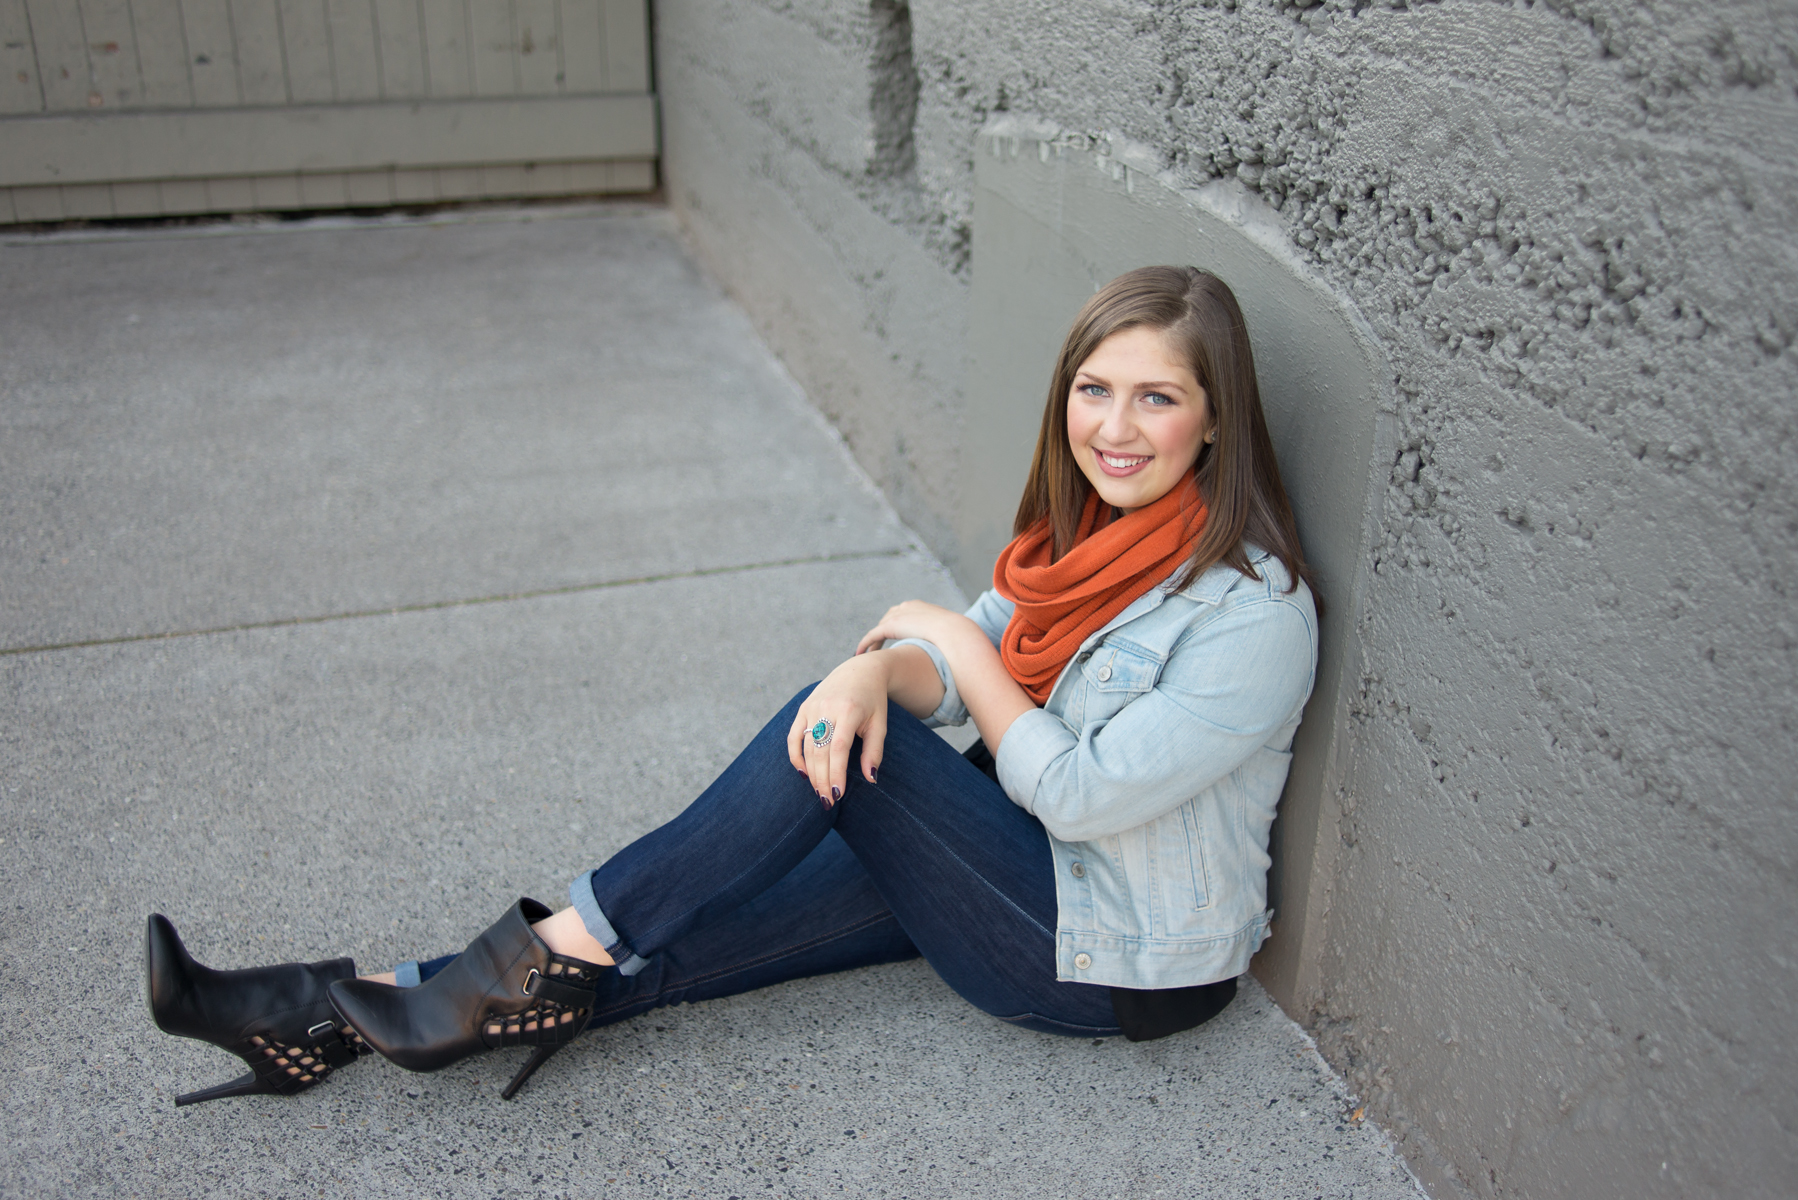 portland-oregon-senior-girl-photographer-shelley-marie-photo-urban-chic-orange-scarf-jean-jacket-professional-makeup-310.jpg